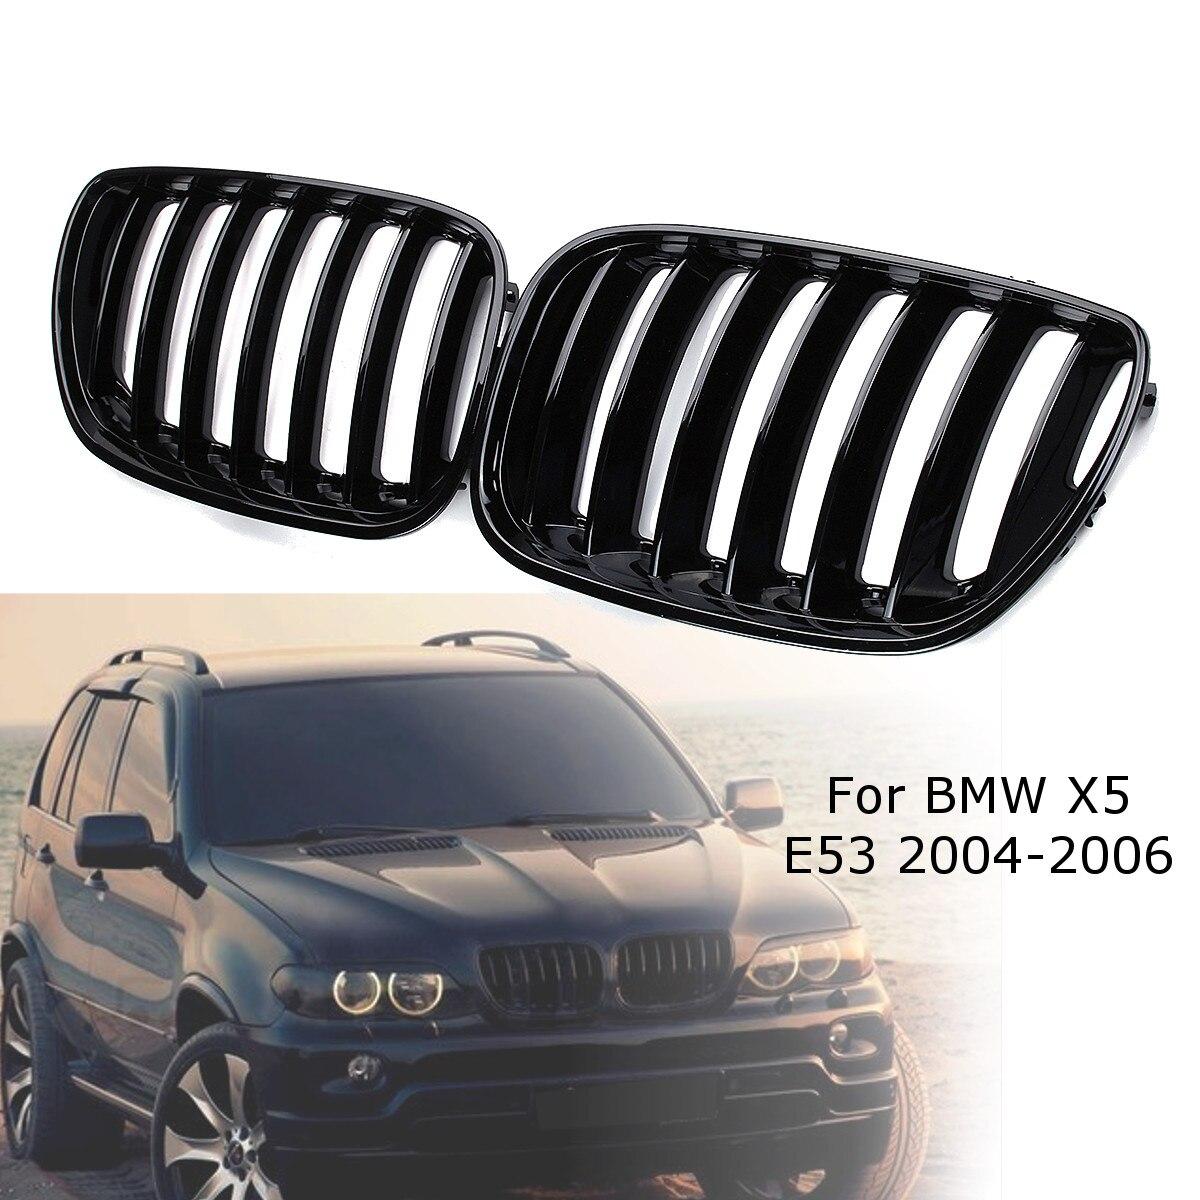 2Pcs GLOSS สีดำด้านหน้ารถย่าง Grilles ขวาและซ้ายสำหรับ BMW X5 E53 2004 2005 2006 ABS 51137124815 51137124816